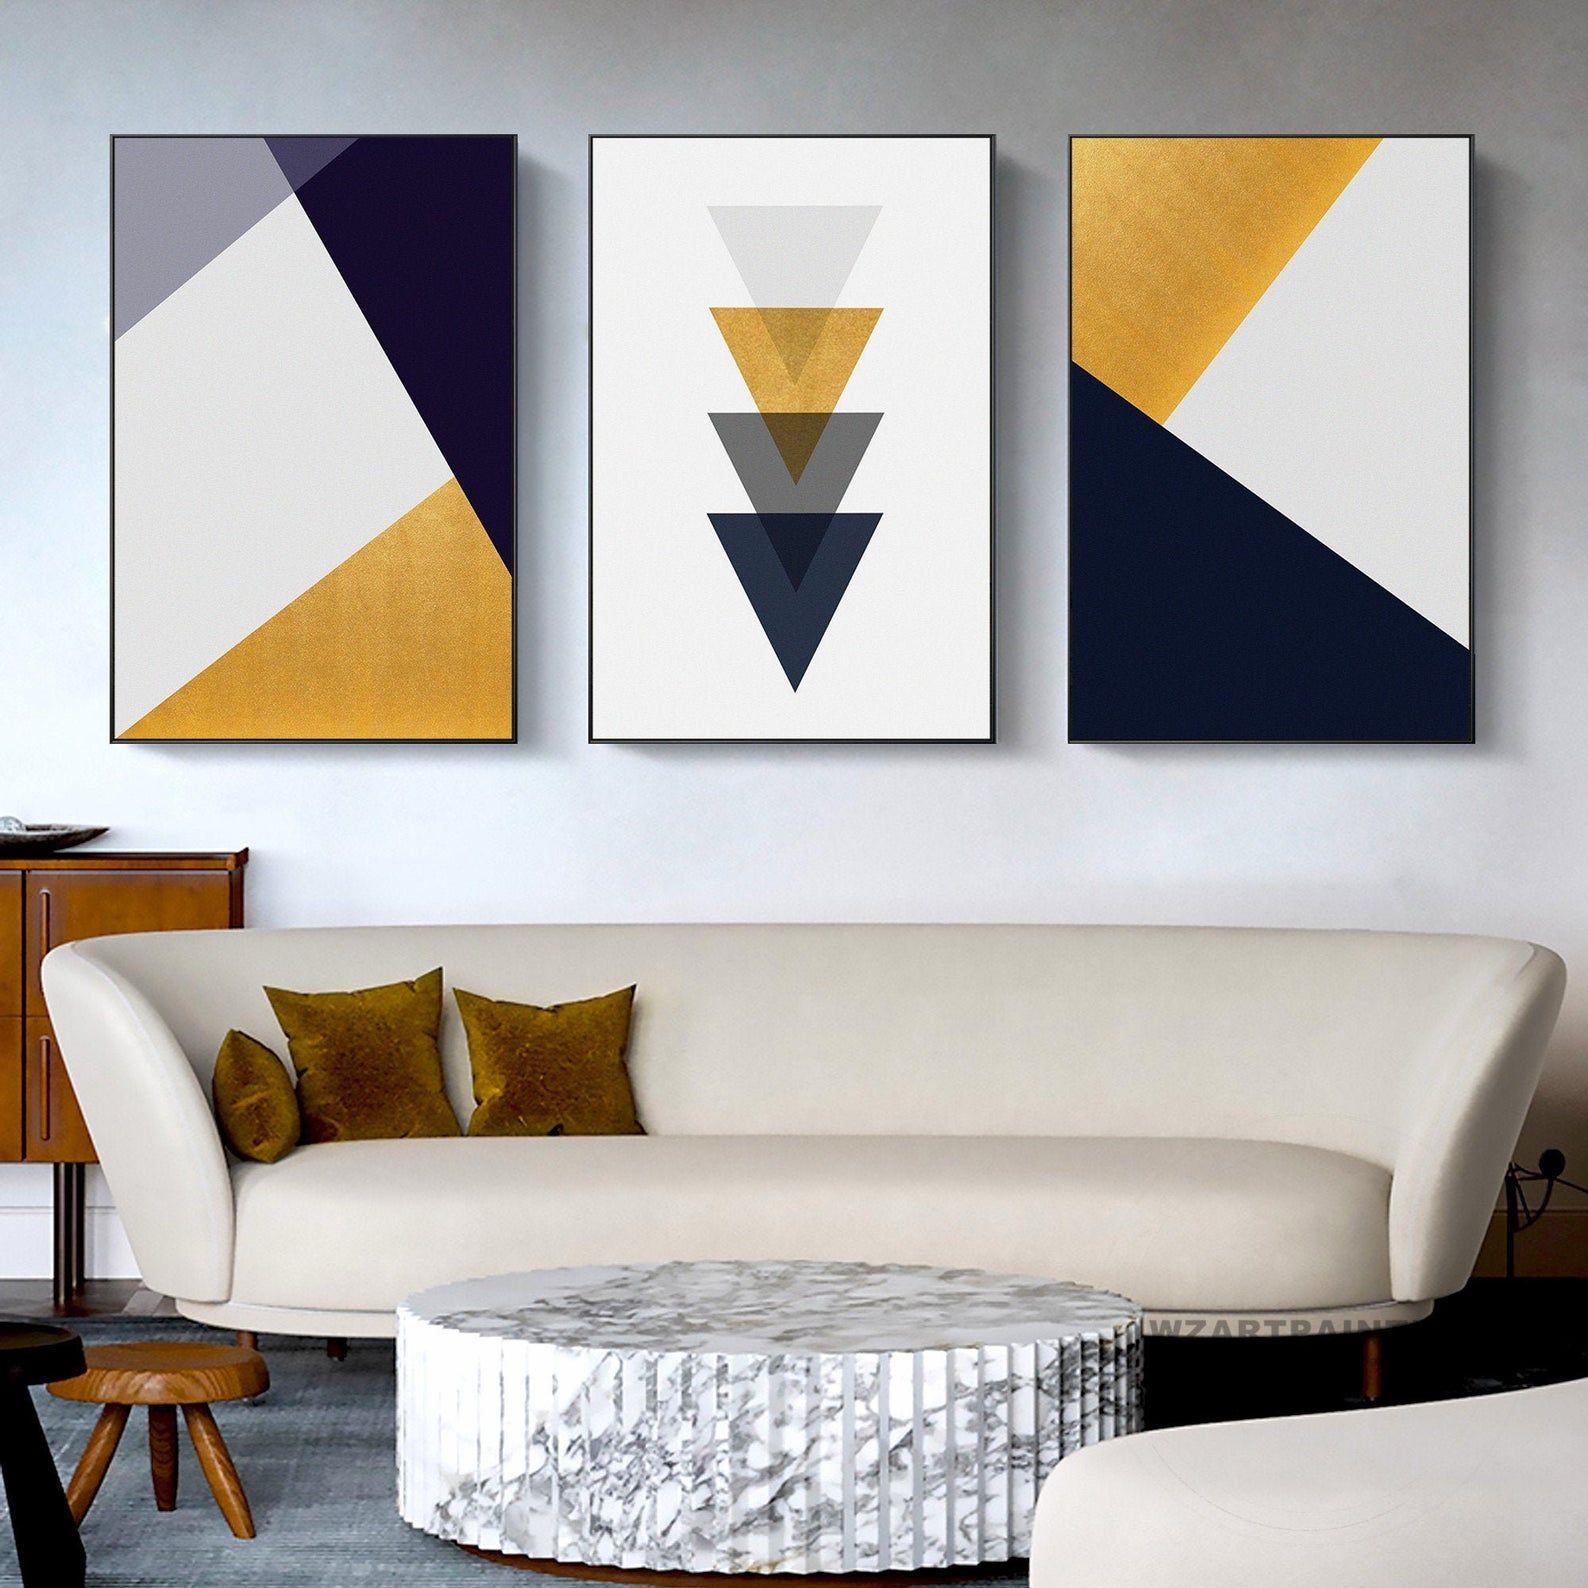 Set Of 3 Framed Wall Art Prints Geometric Abstract Black Etsy Diy Canvas Wall Art Geometric Wall Art Canvas Painting Diy